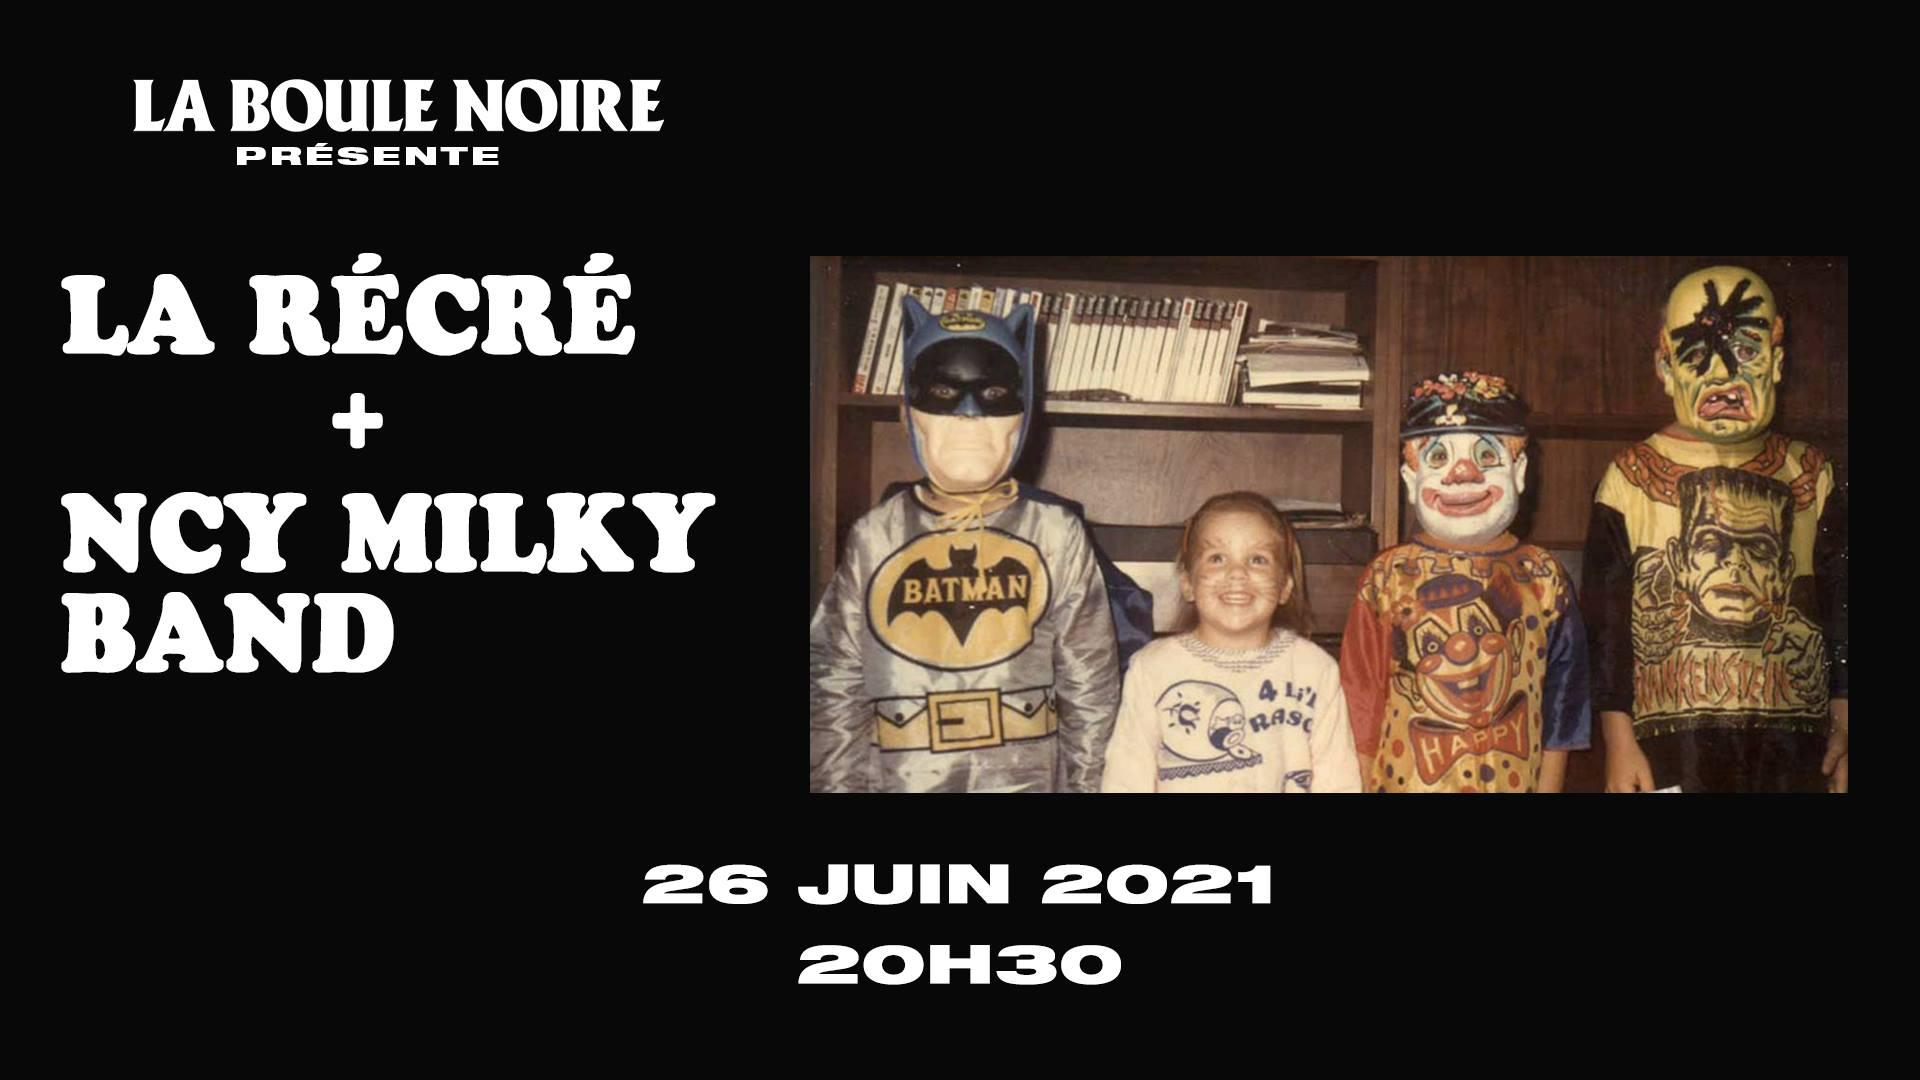 NCY milky band